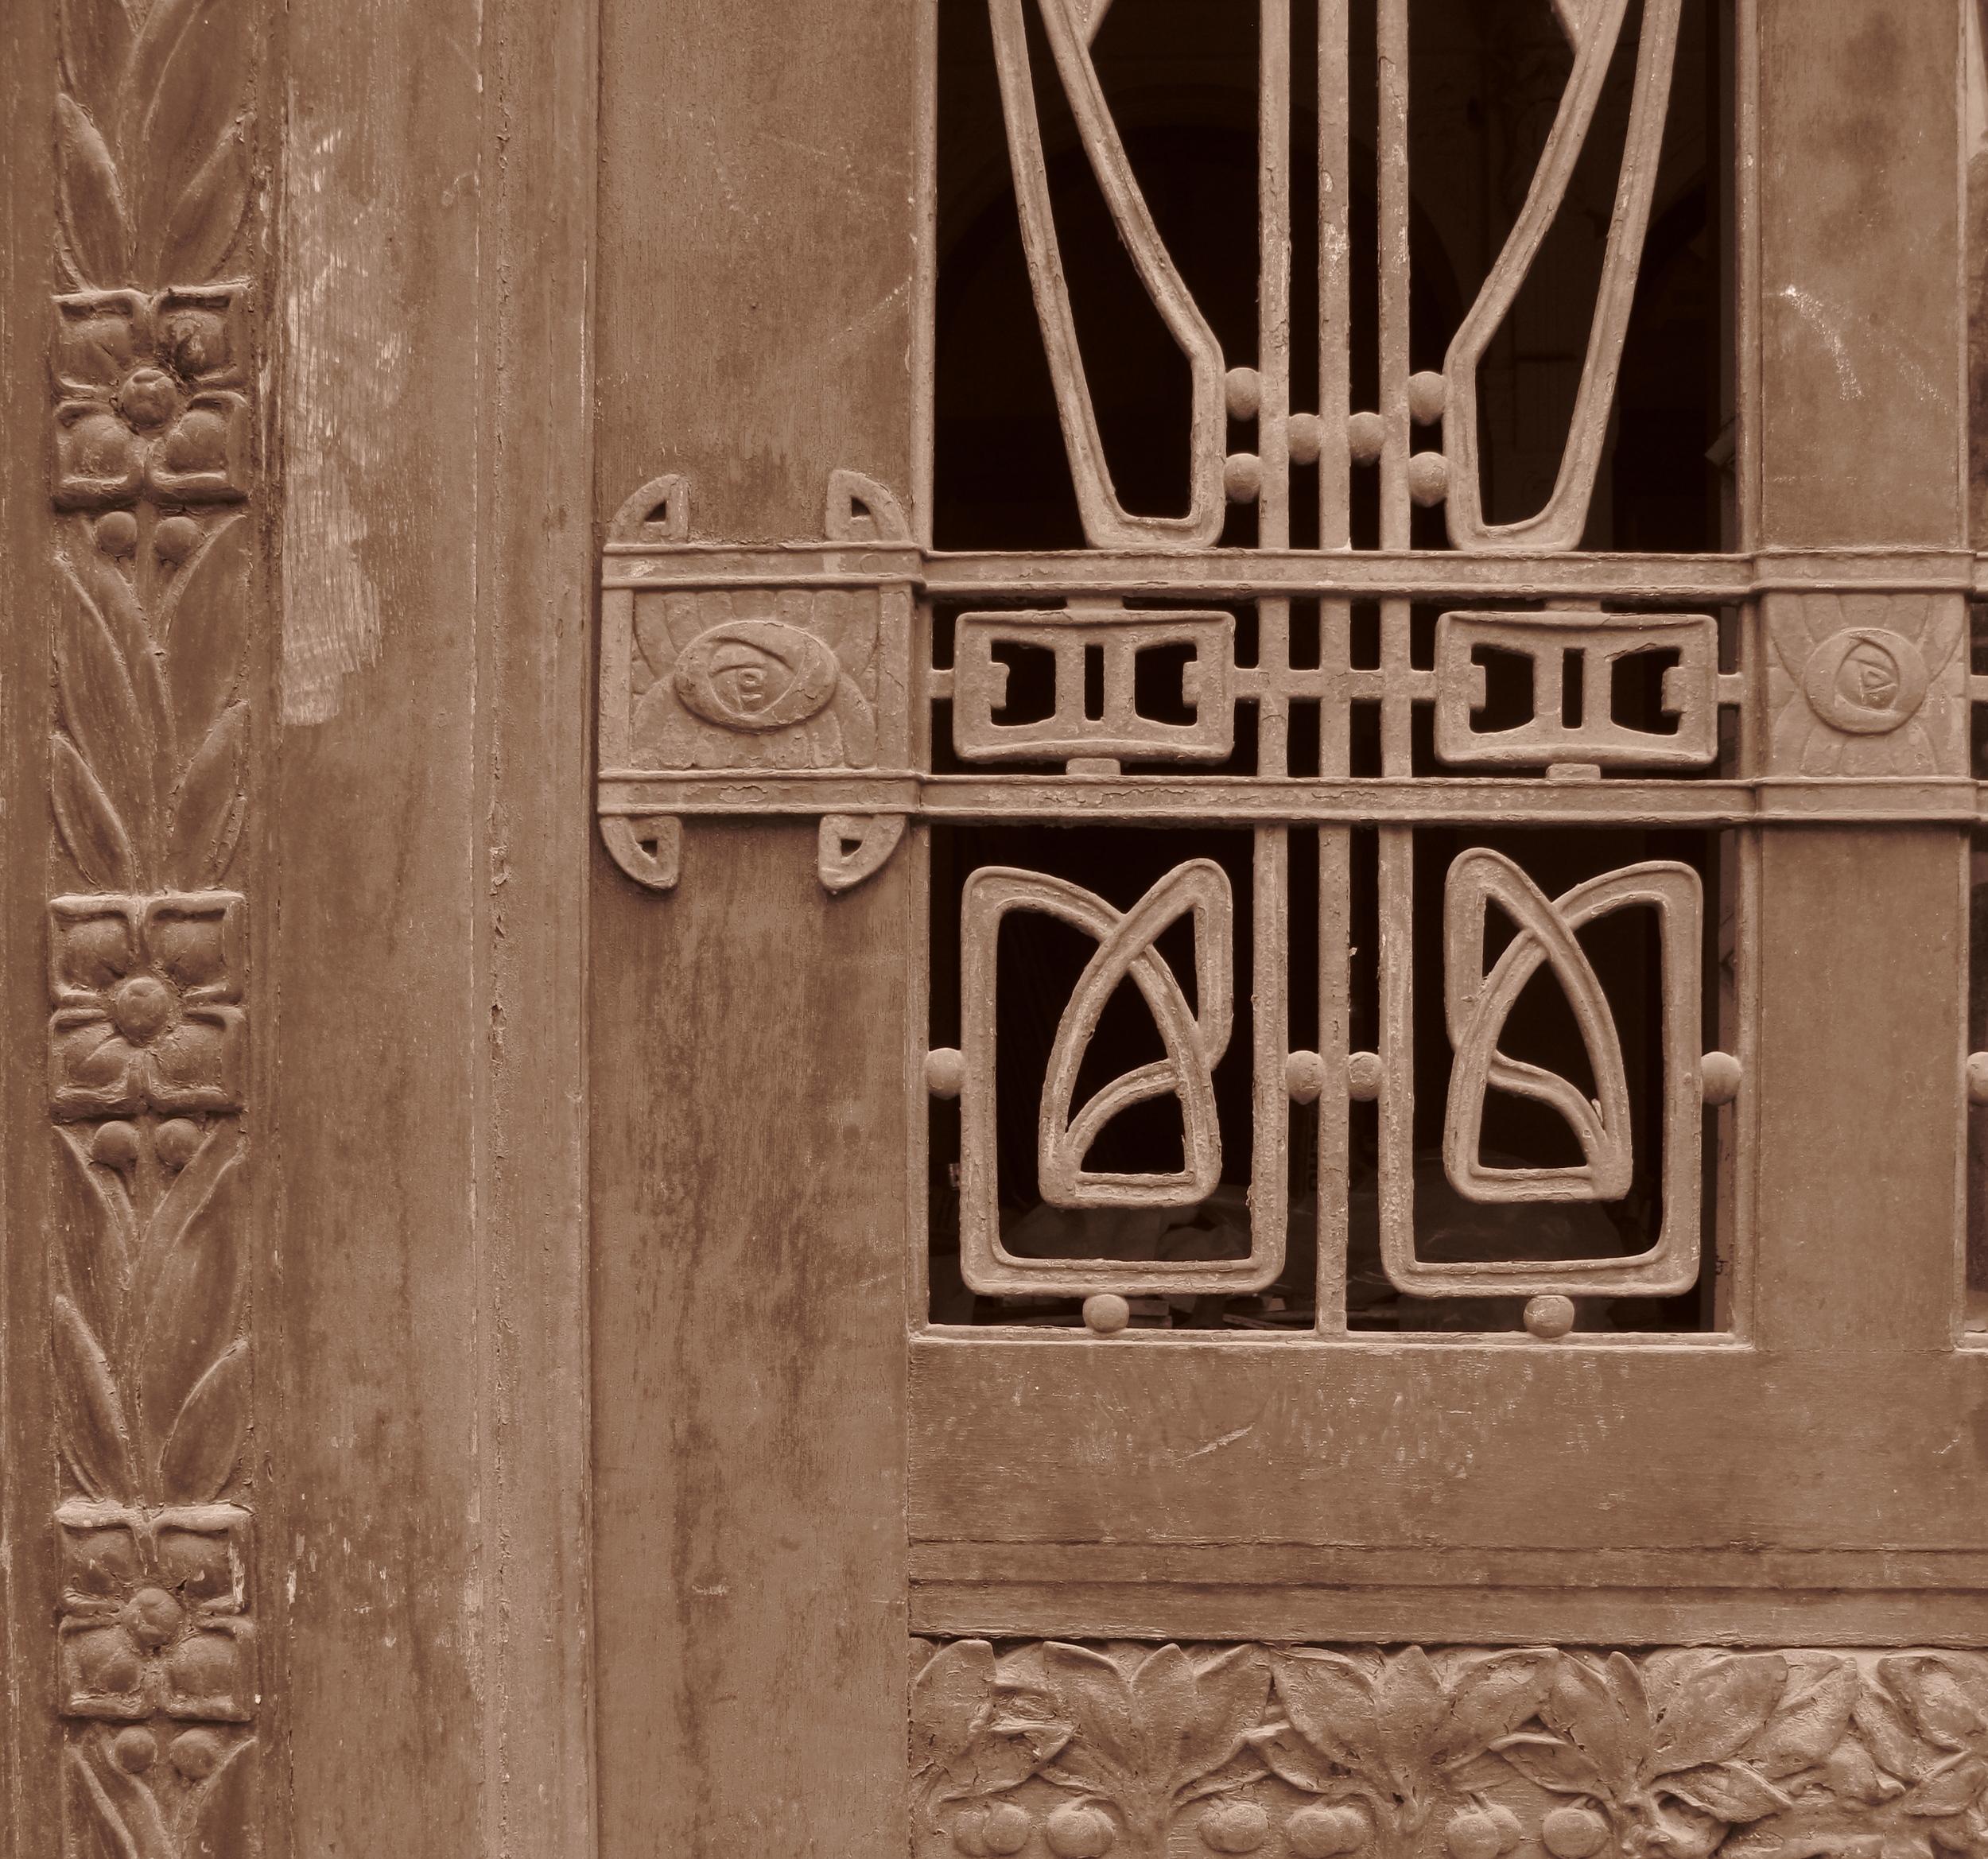 Old art nouveau metal work, bohemian Czech Republic.